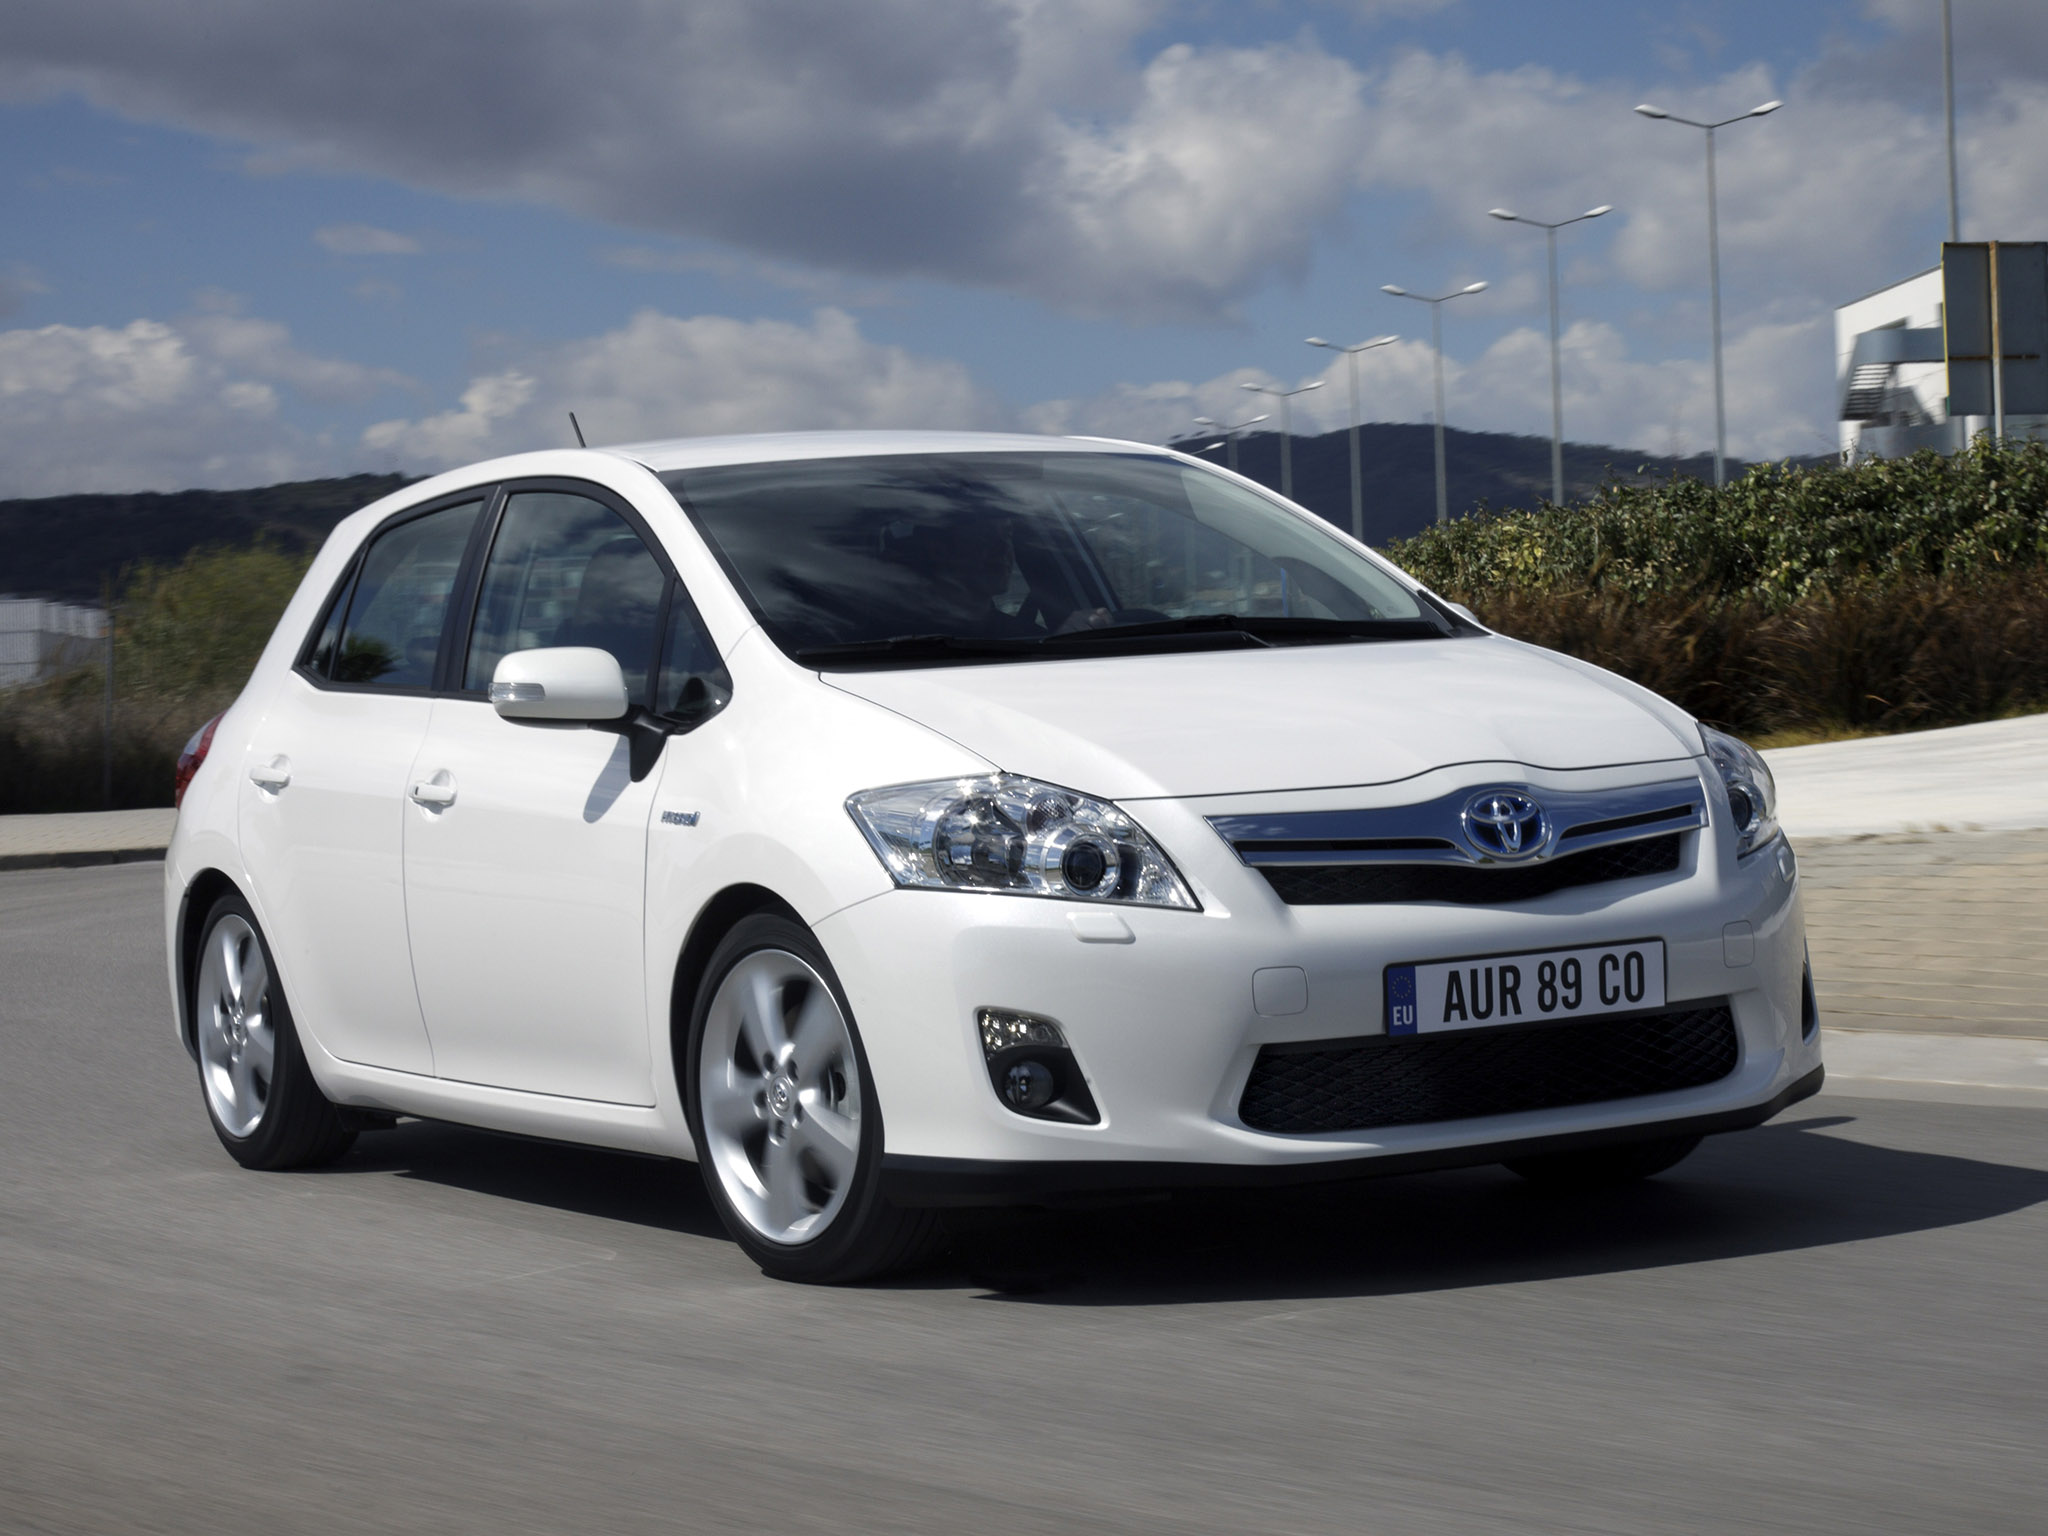 Toyota Аурис форум #11